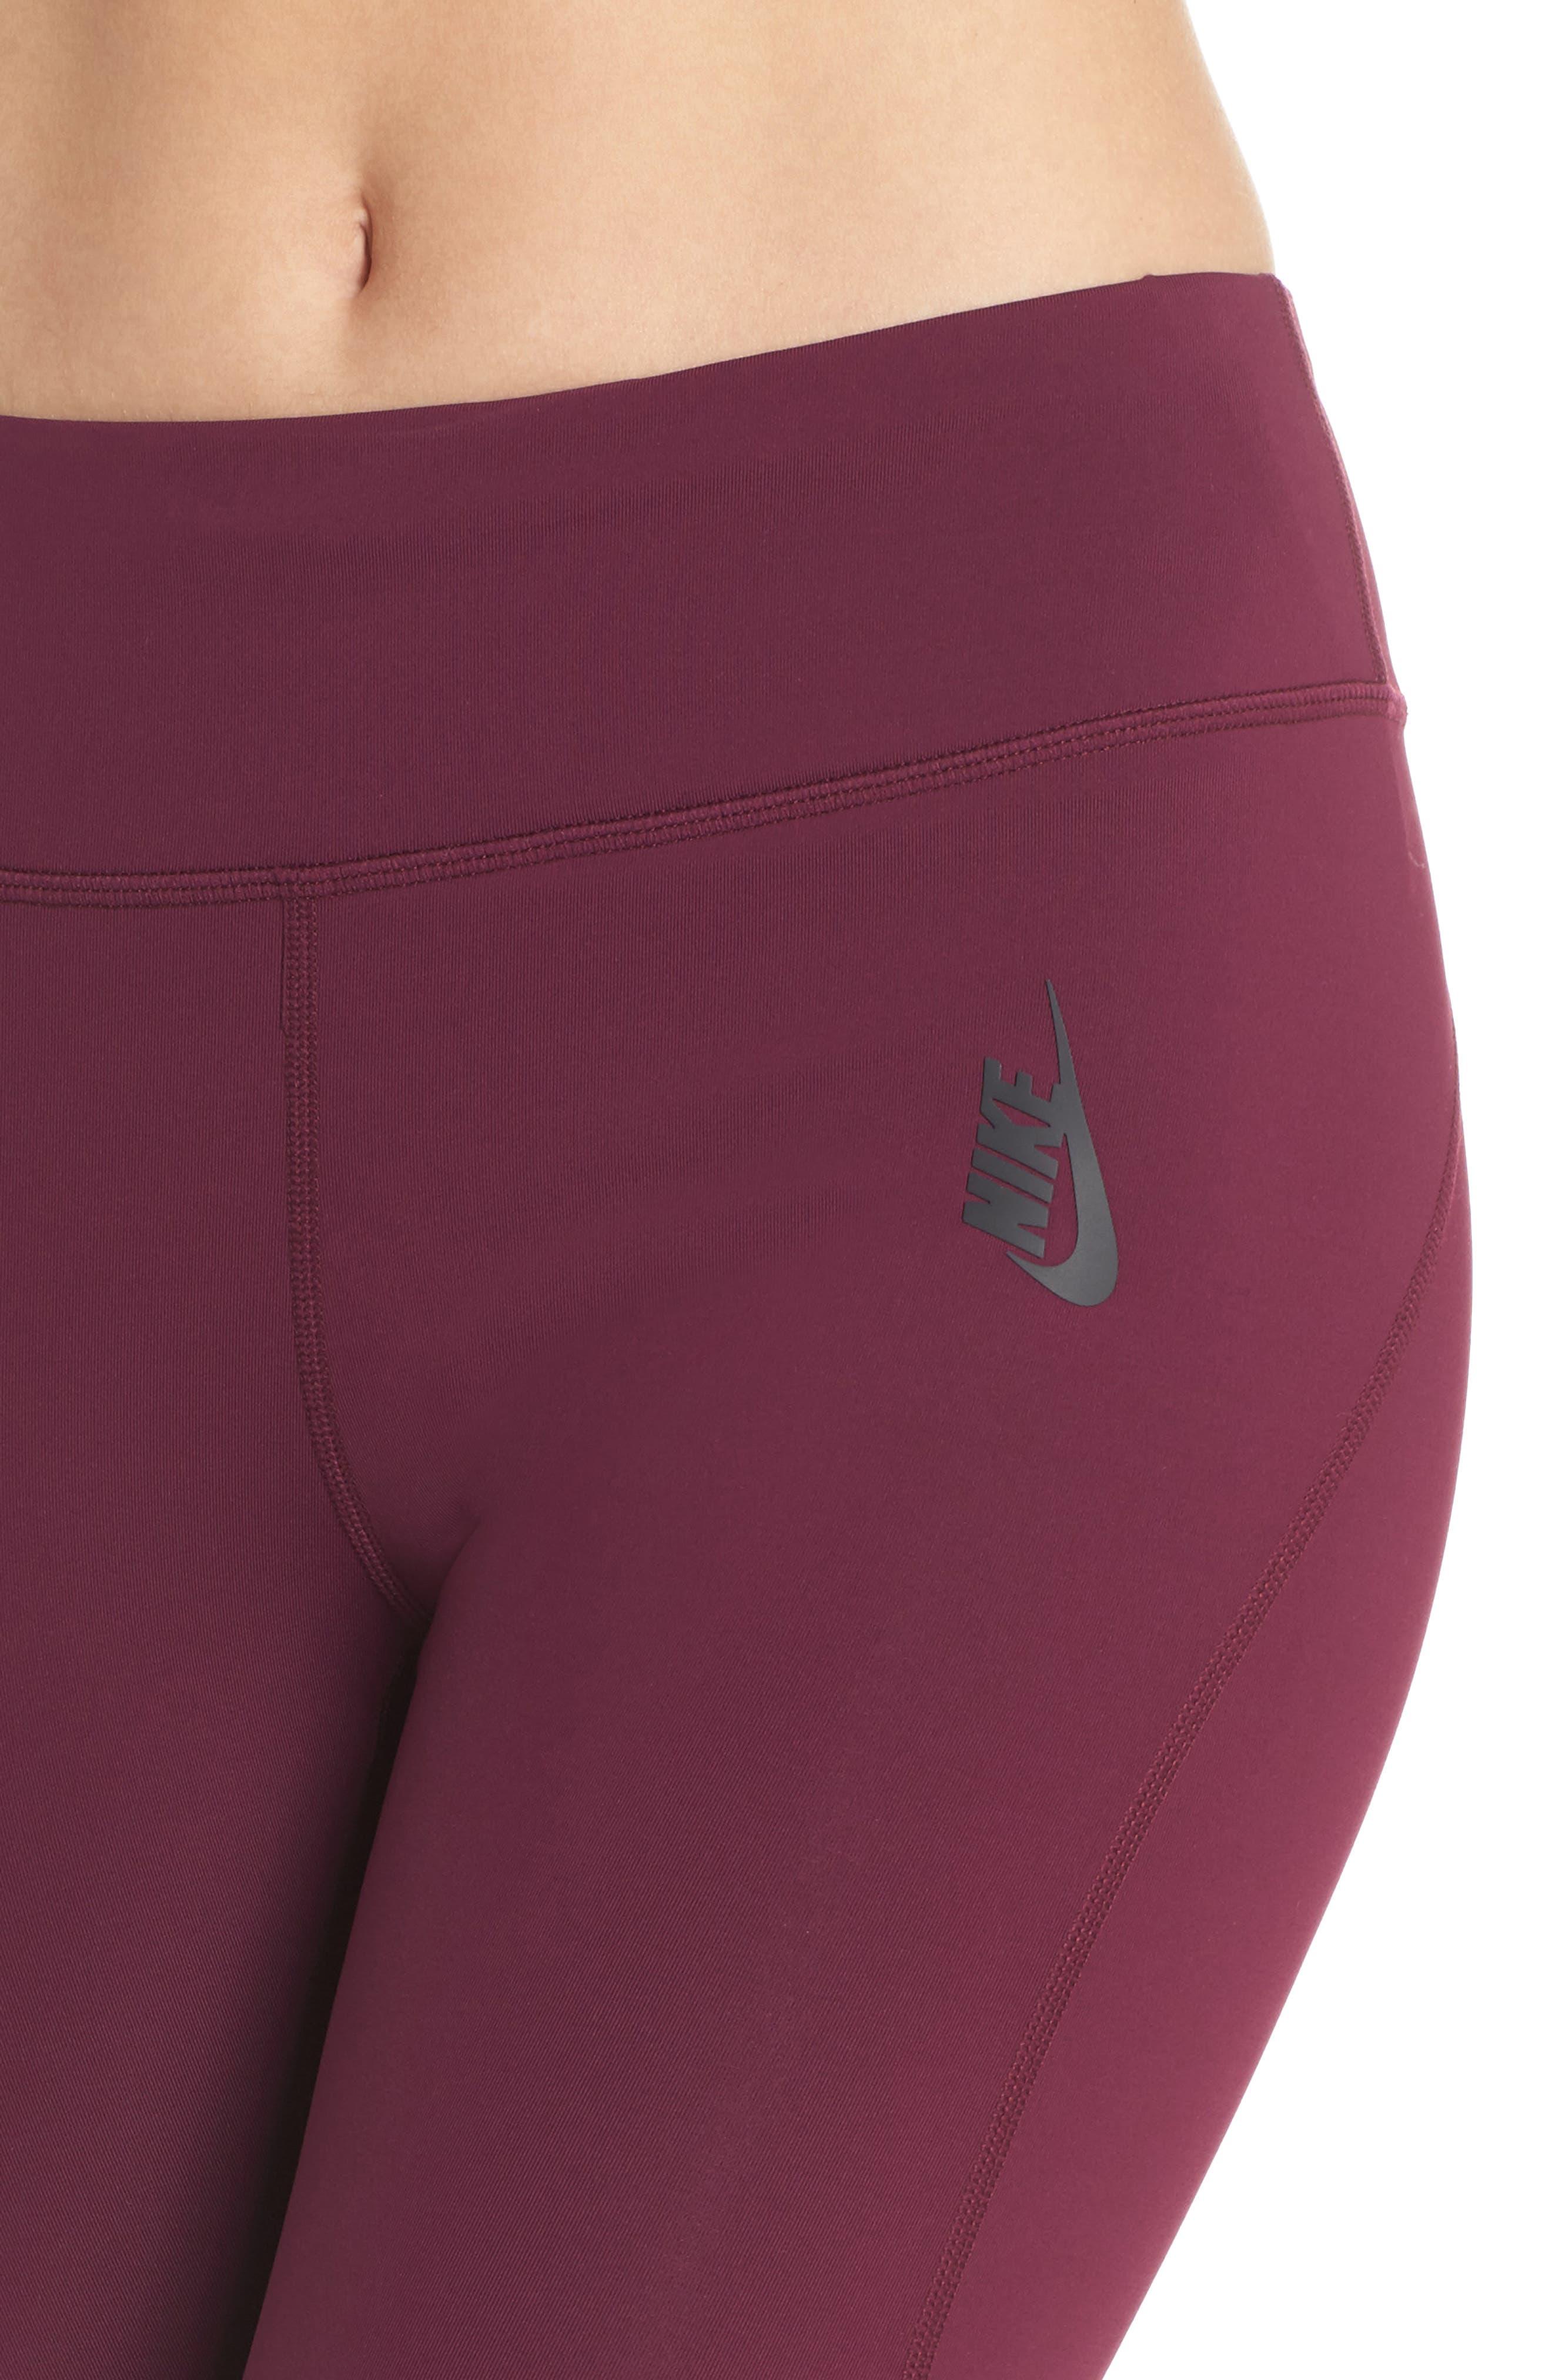 NikeLab Collection Dri-FIT Women's Tights,                             Alternate thumbnail 4, color,                             BORDEAUX